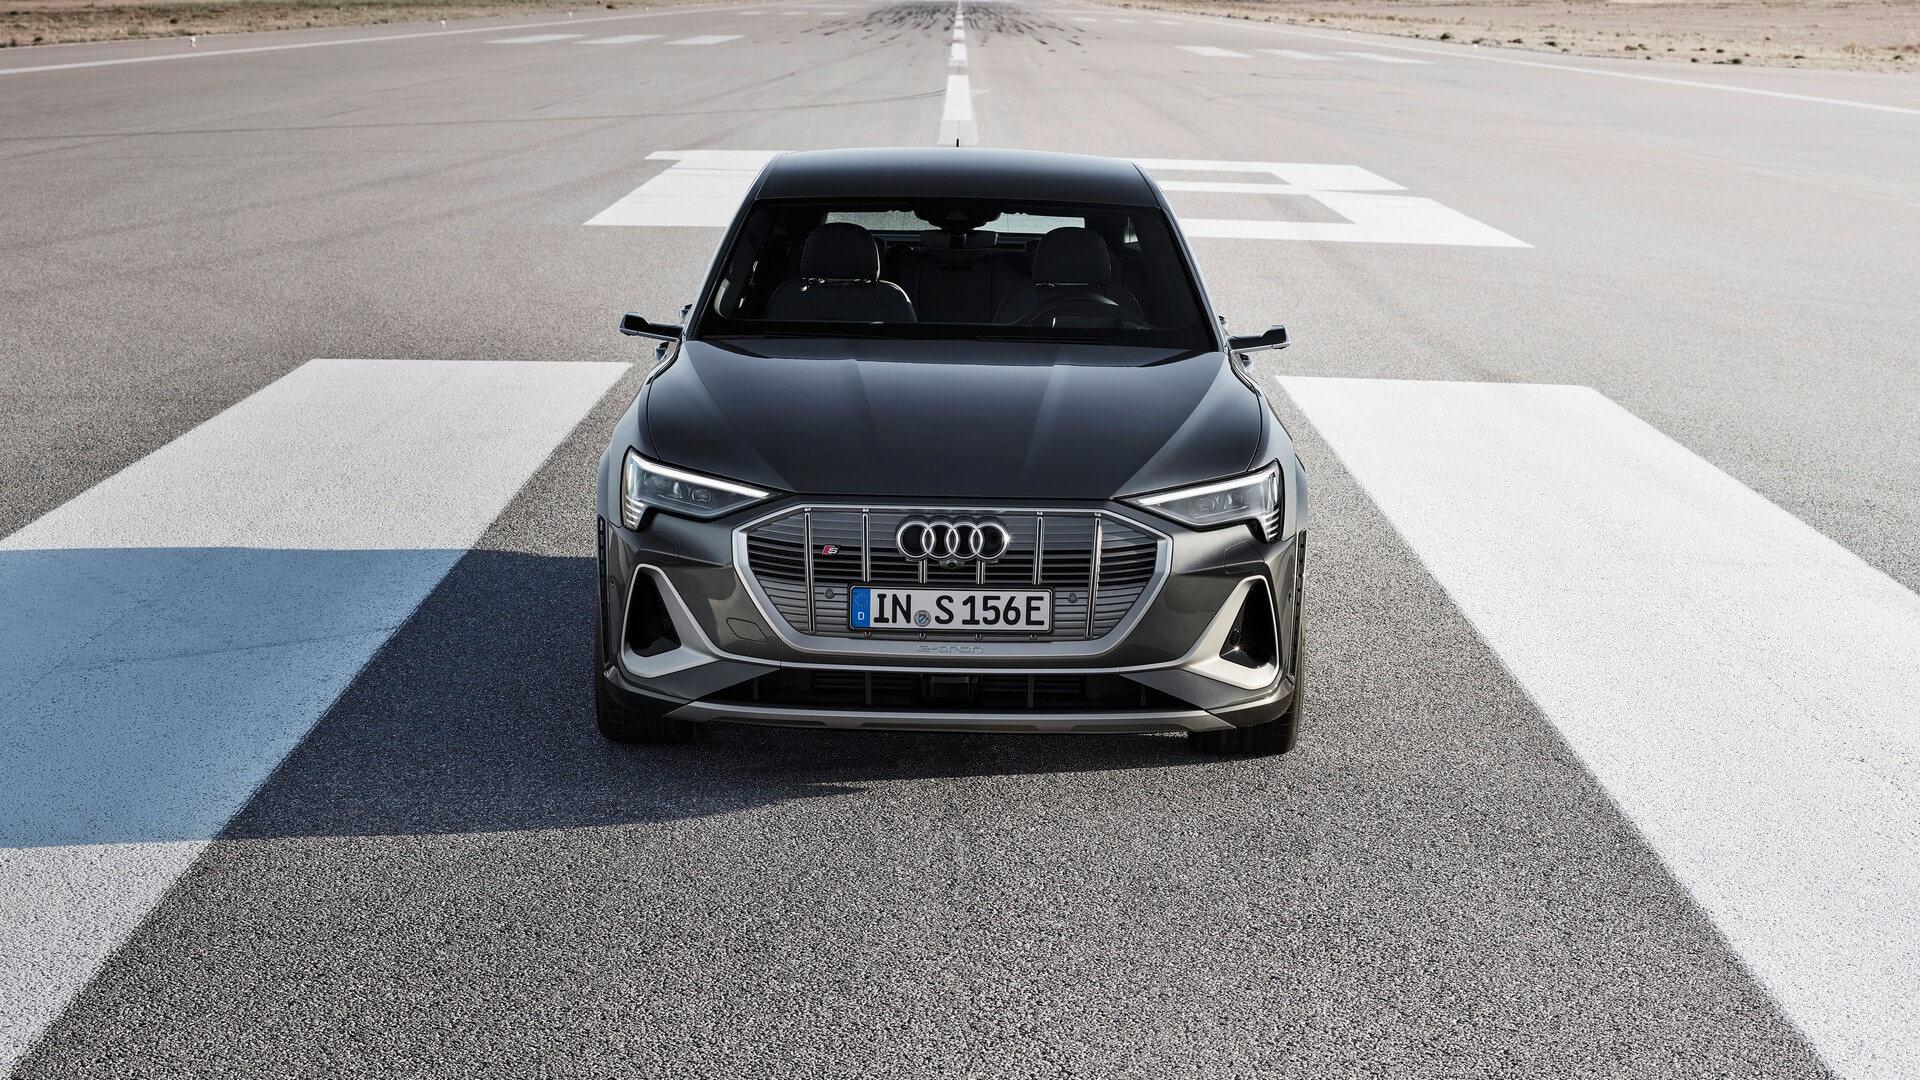 Audi-E-Tron-S-and-E-Tron-S-Sportback-2020-77